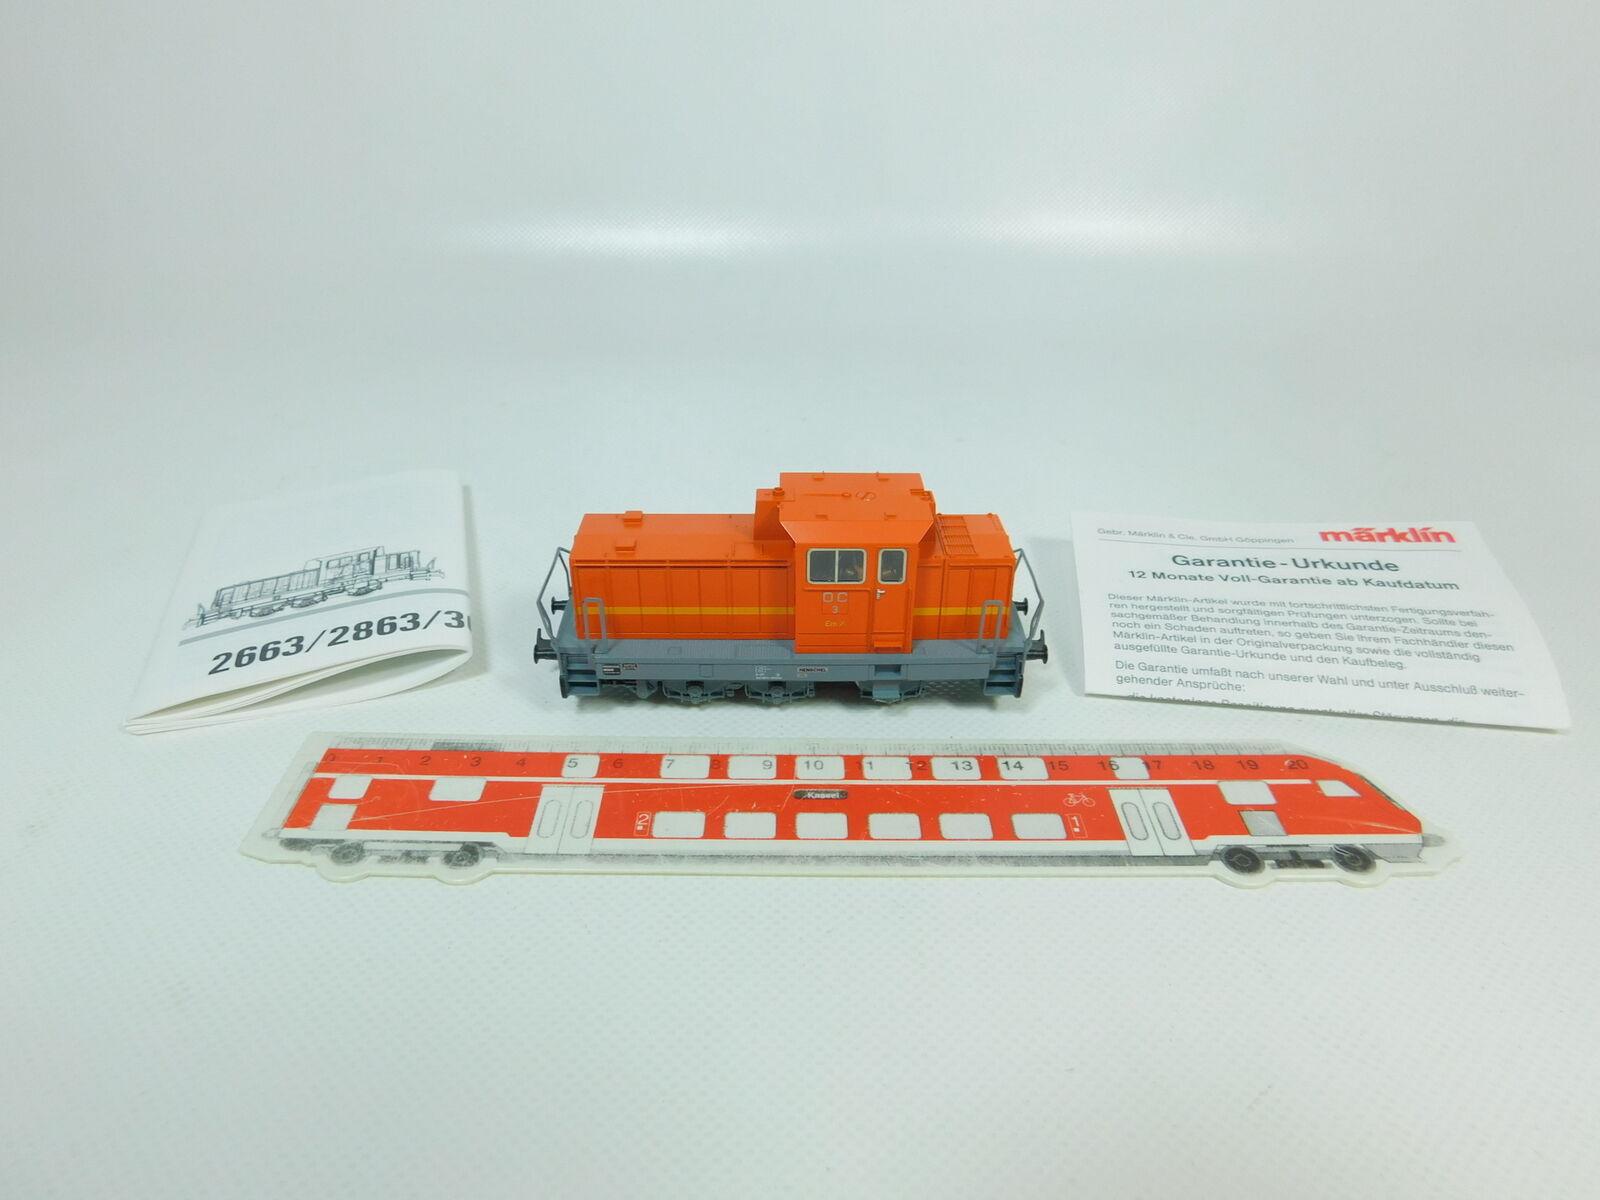 Bo131-0, 5  Märklin h0 ac DIESEL (3088.6 da Set 2847) DHG 700 C OC 3, Neuw